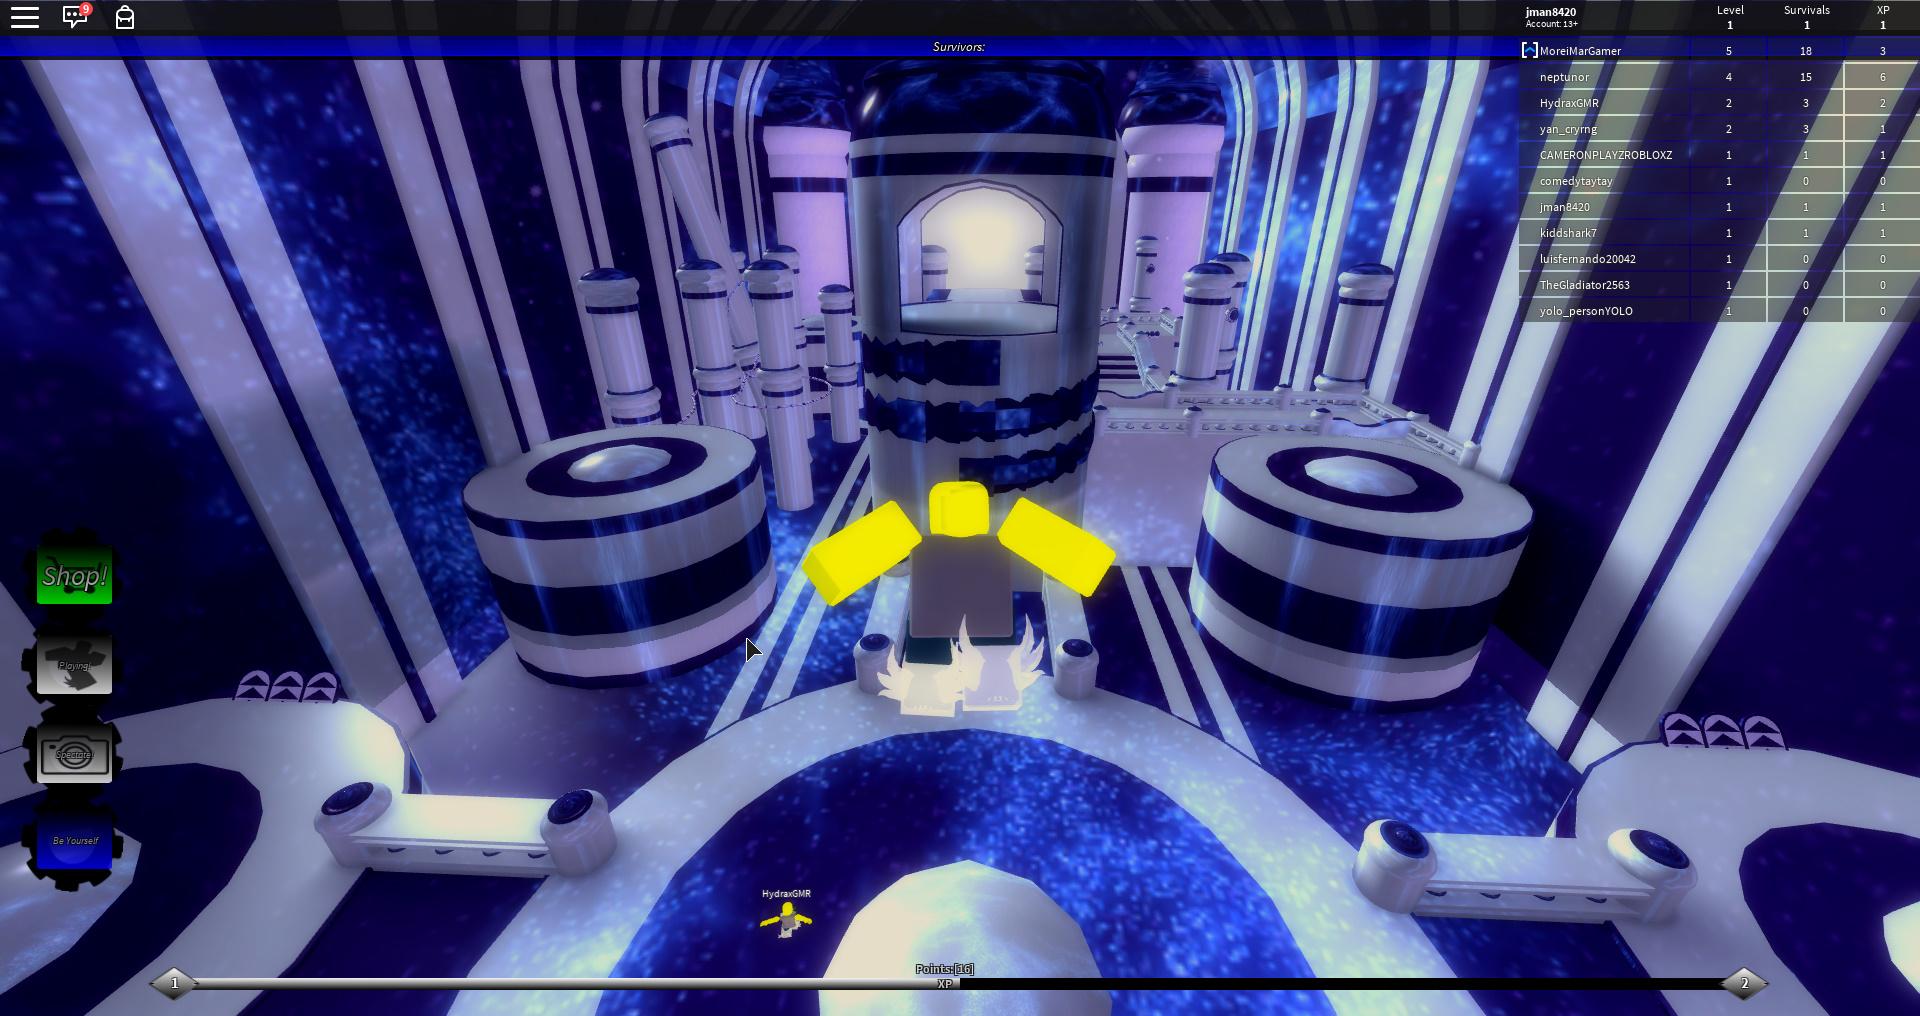 Aaa Roblox Account The Doom Wall 2 On Roblox 10 Tips And Tricks Heavy Com